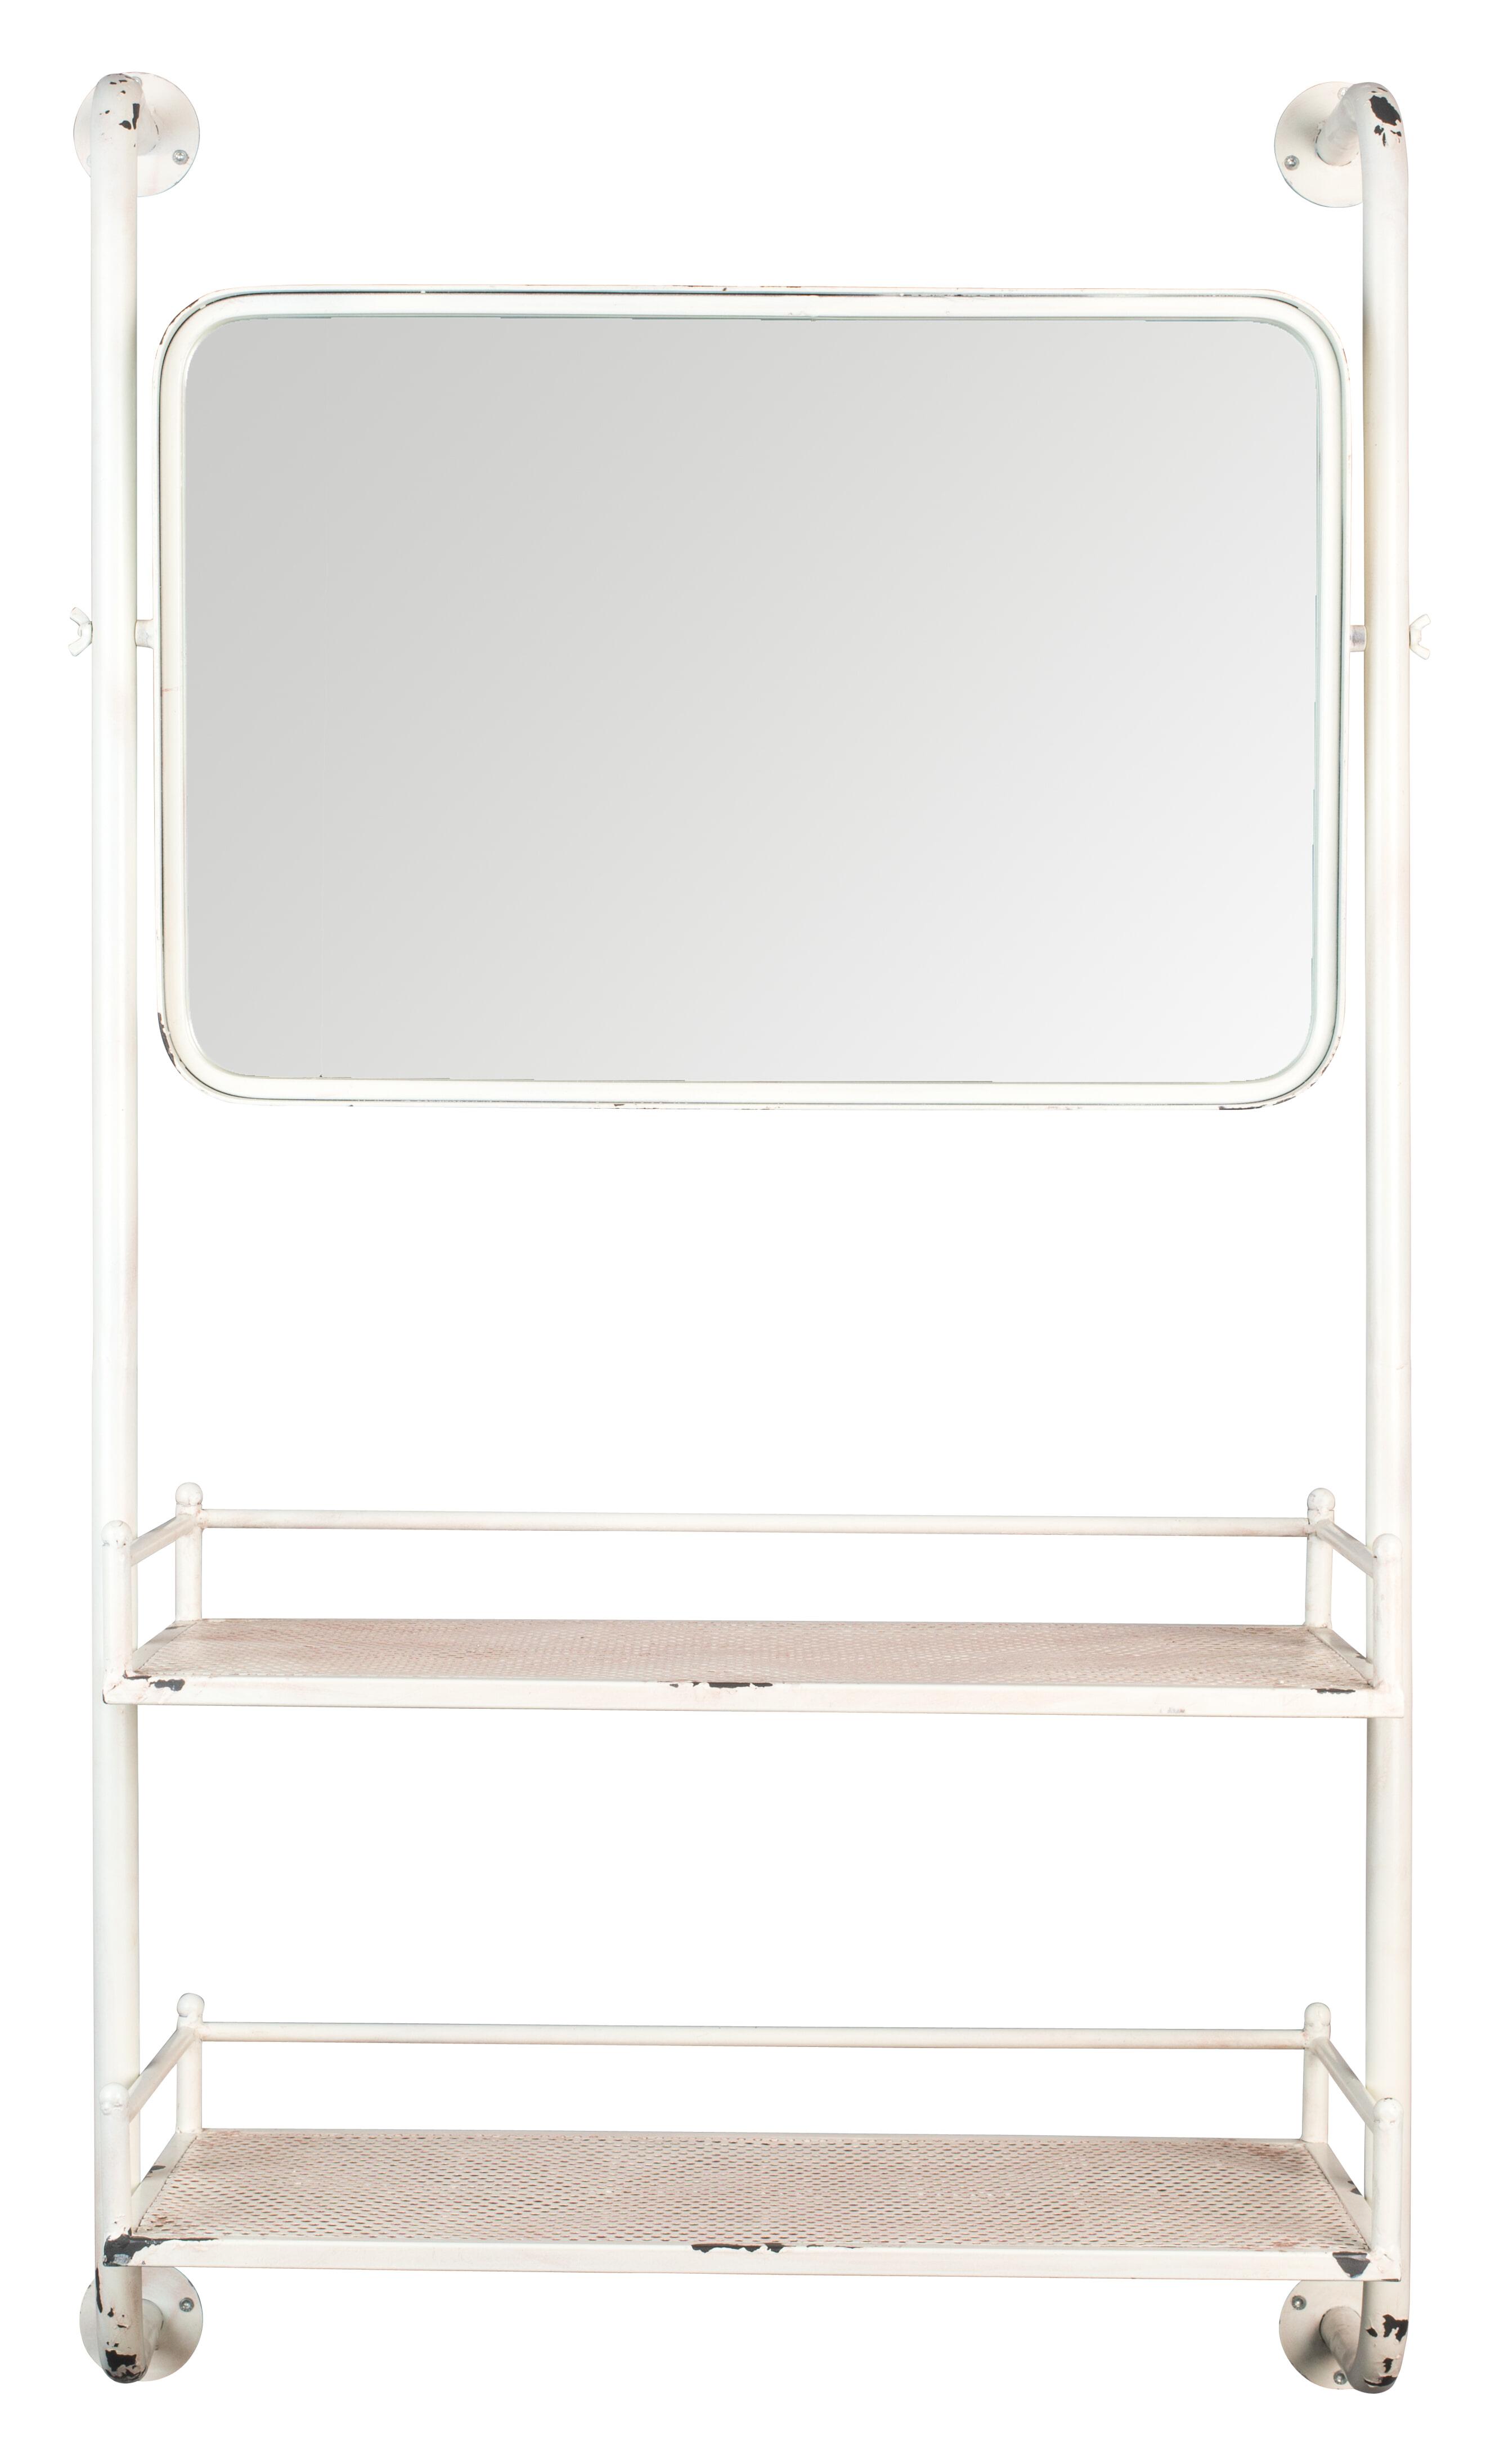 Dutchbone Wandrek 'Barber' met spiegel, 120 x 70cm